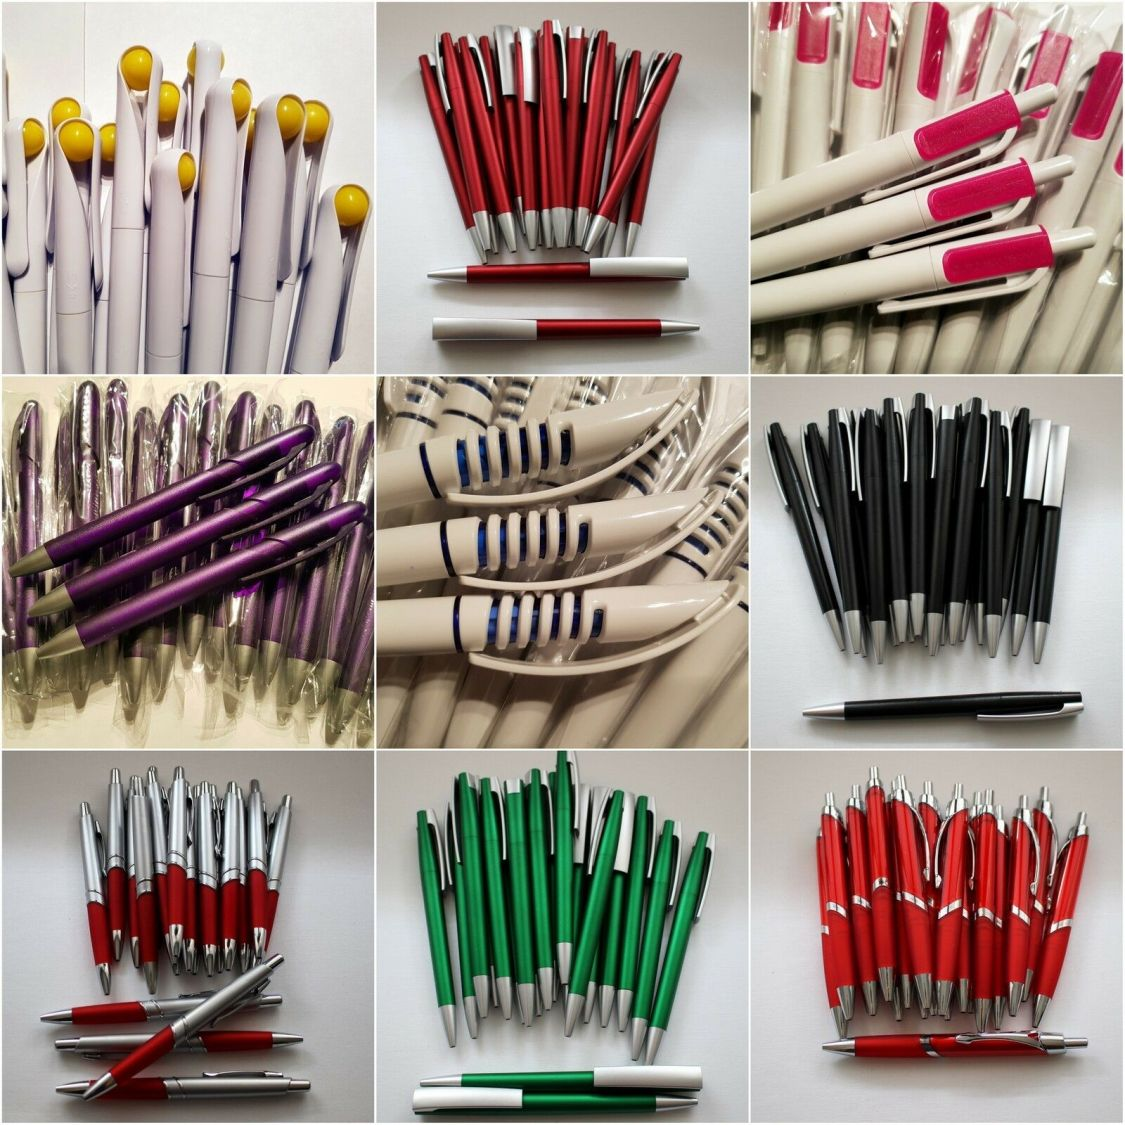 20 Kugelschreiber Kuli Stift Kulis Schreibfarbe Blau Kugelschreiber Set NEU